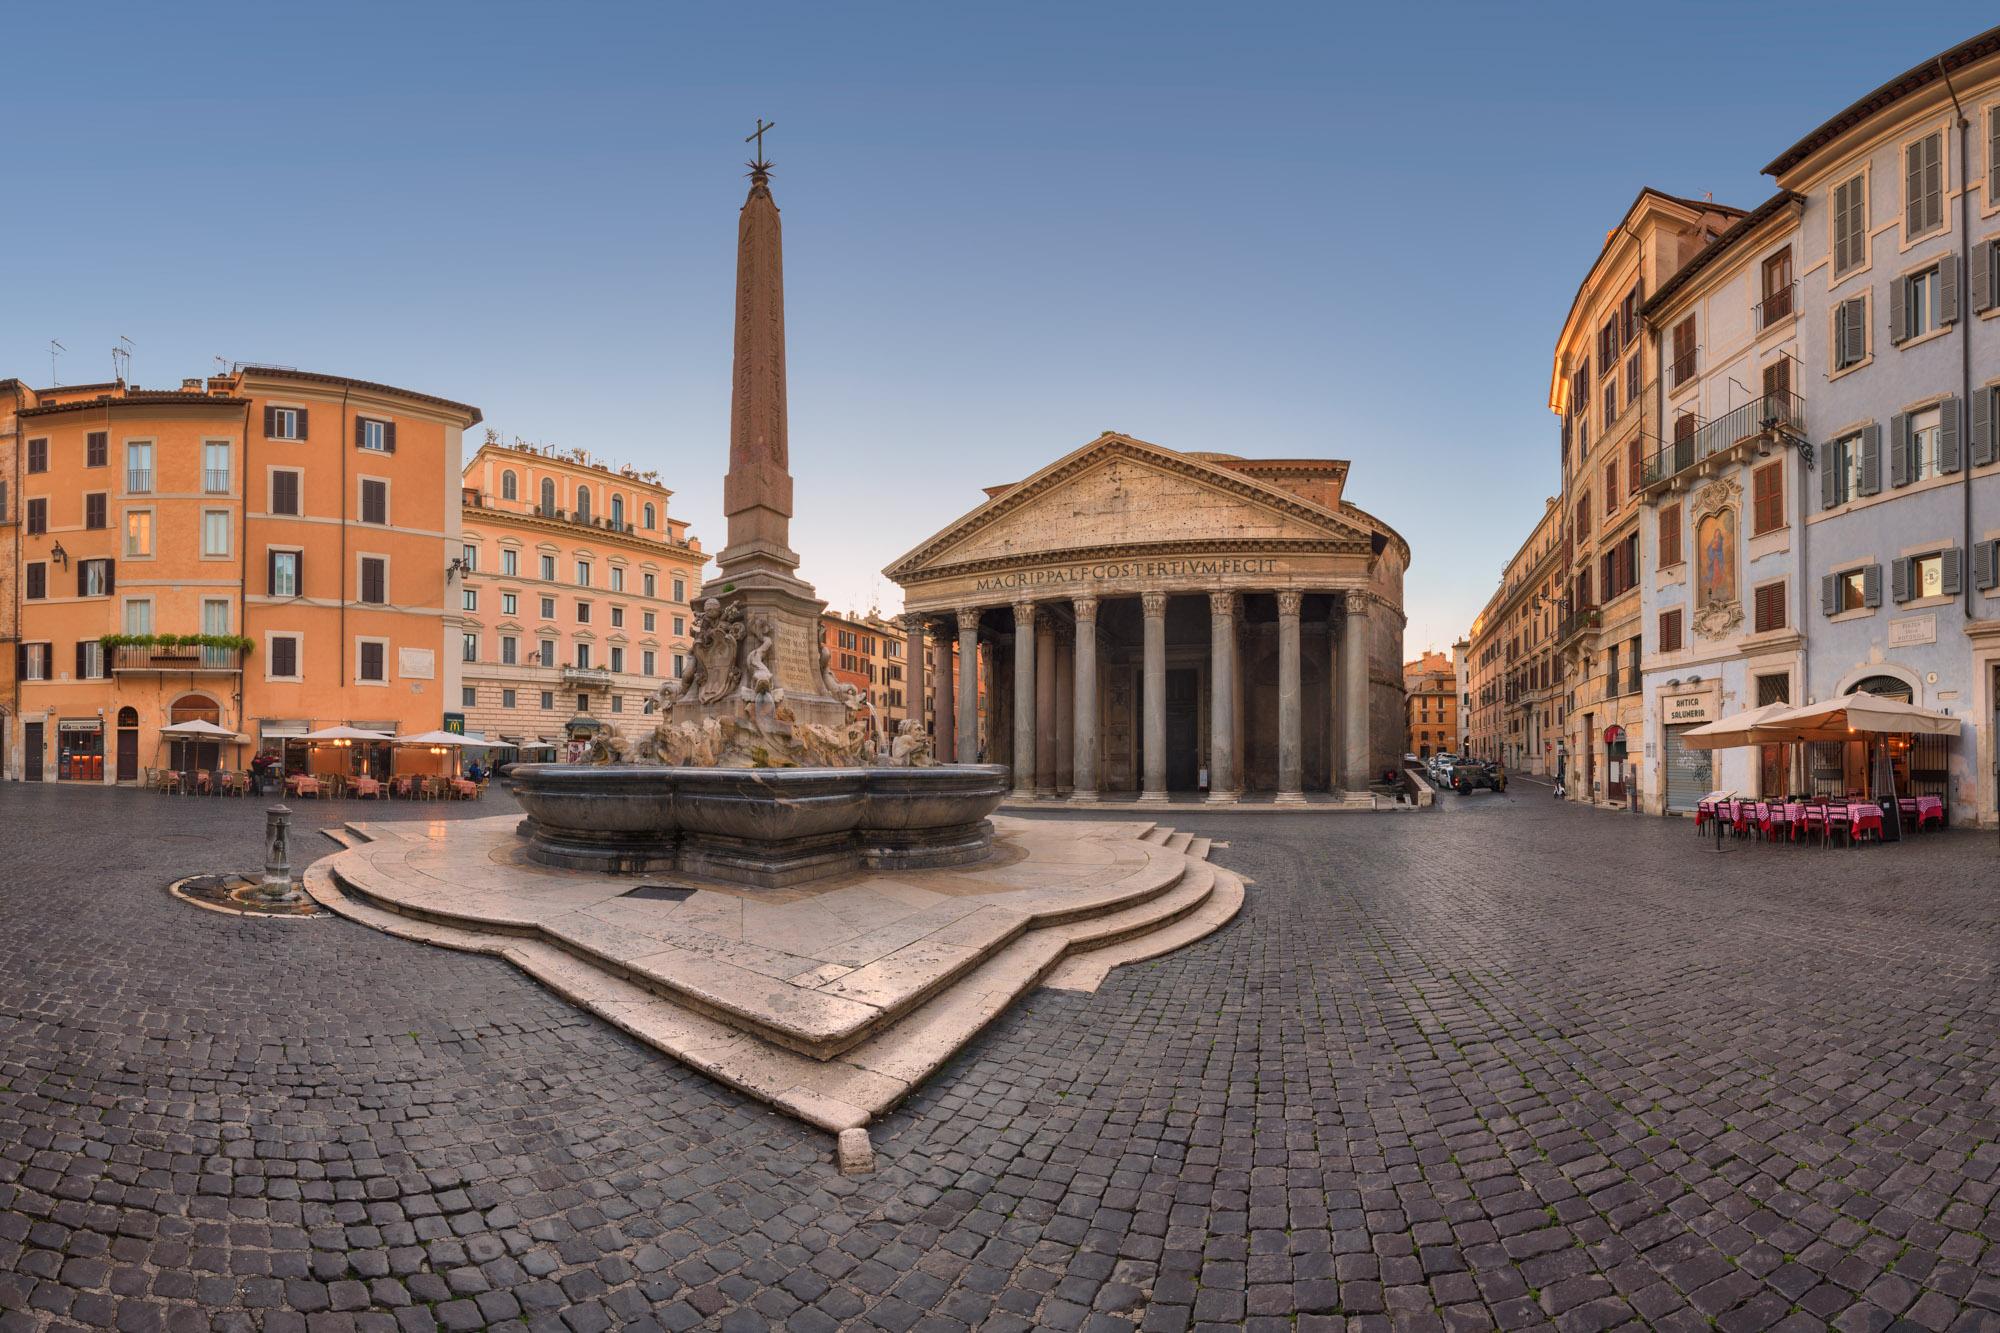 Piazza della Rotonda, Pantheon, Rome, Italy